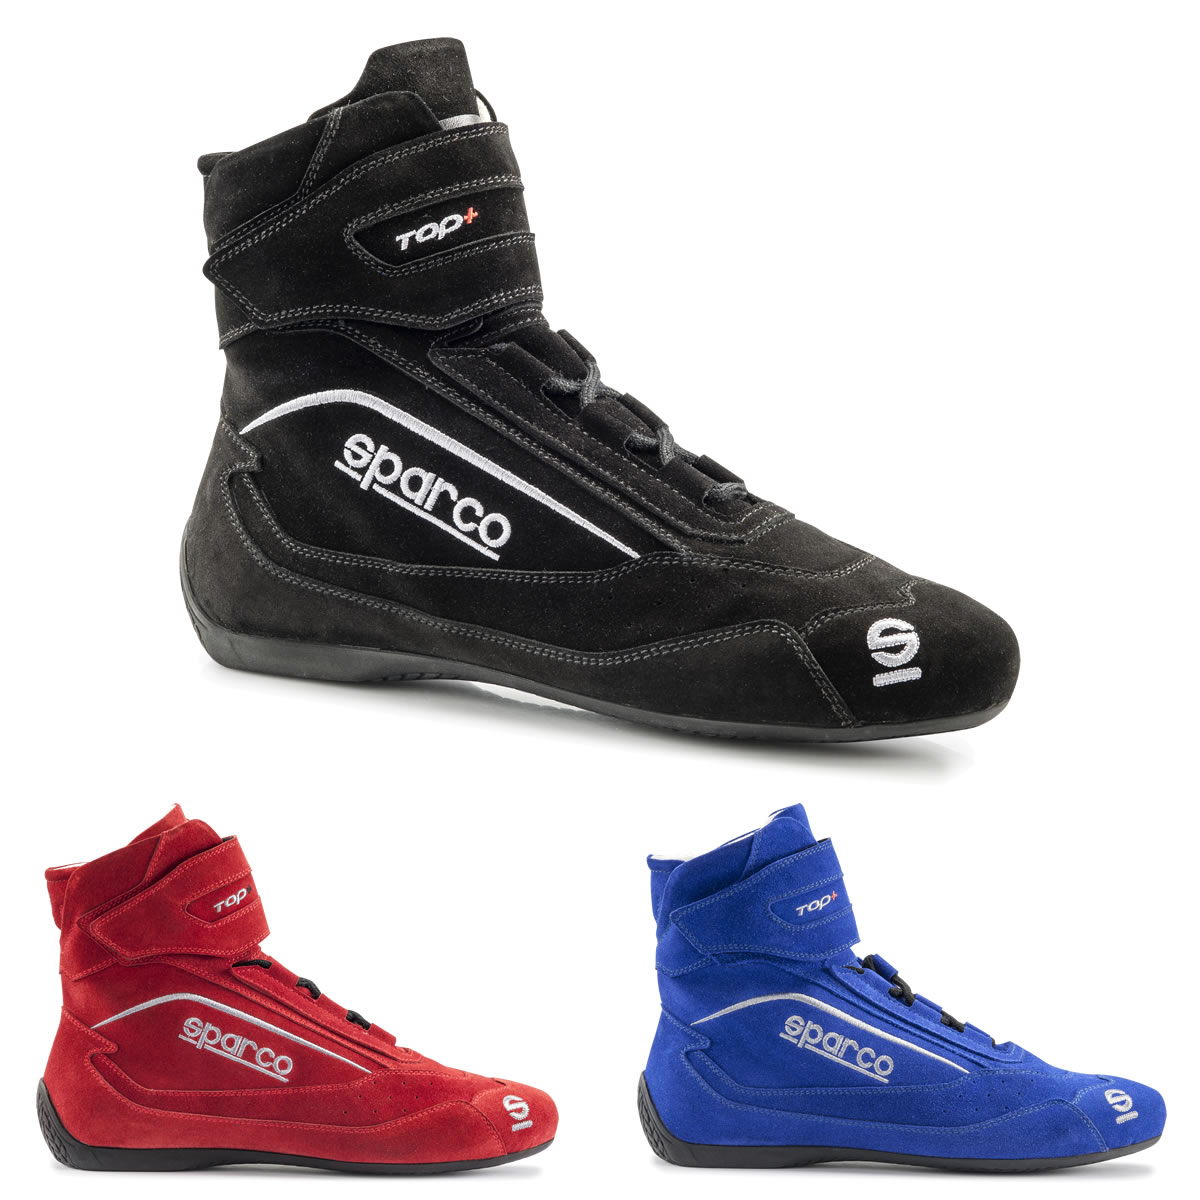 Sparco/スパルコ レーシングシューズ TOP+SH5 FIA2000公認:レーシングストアStar5